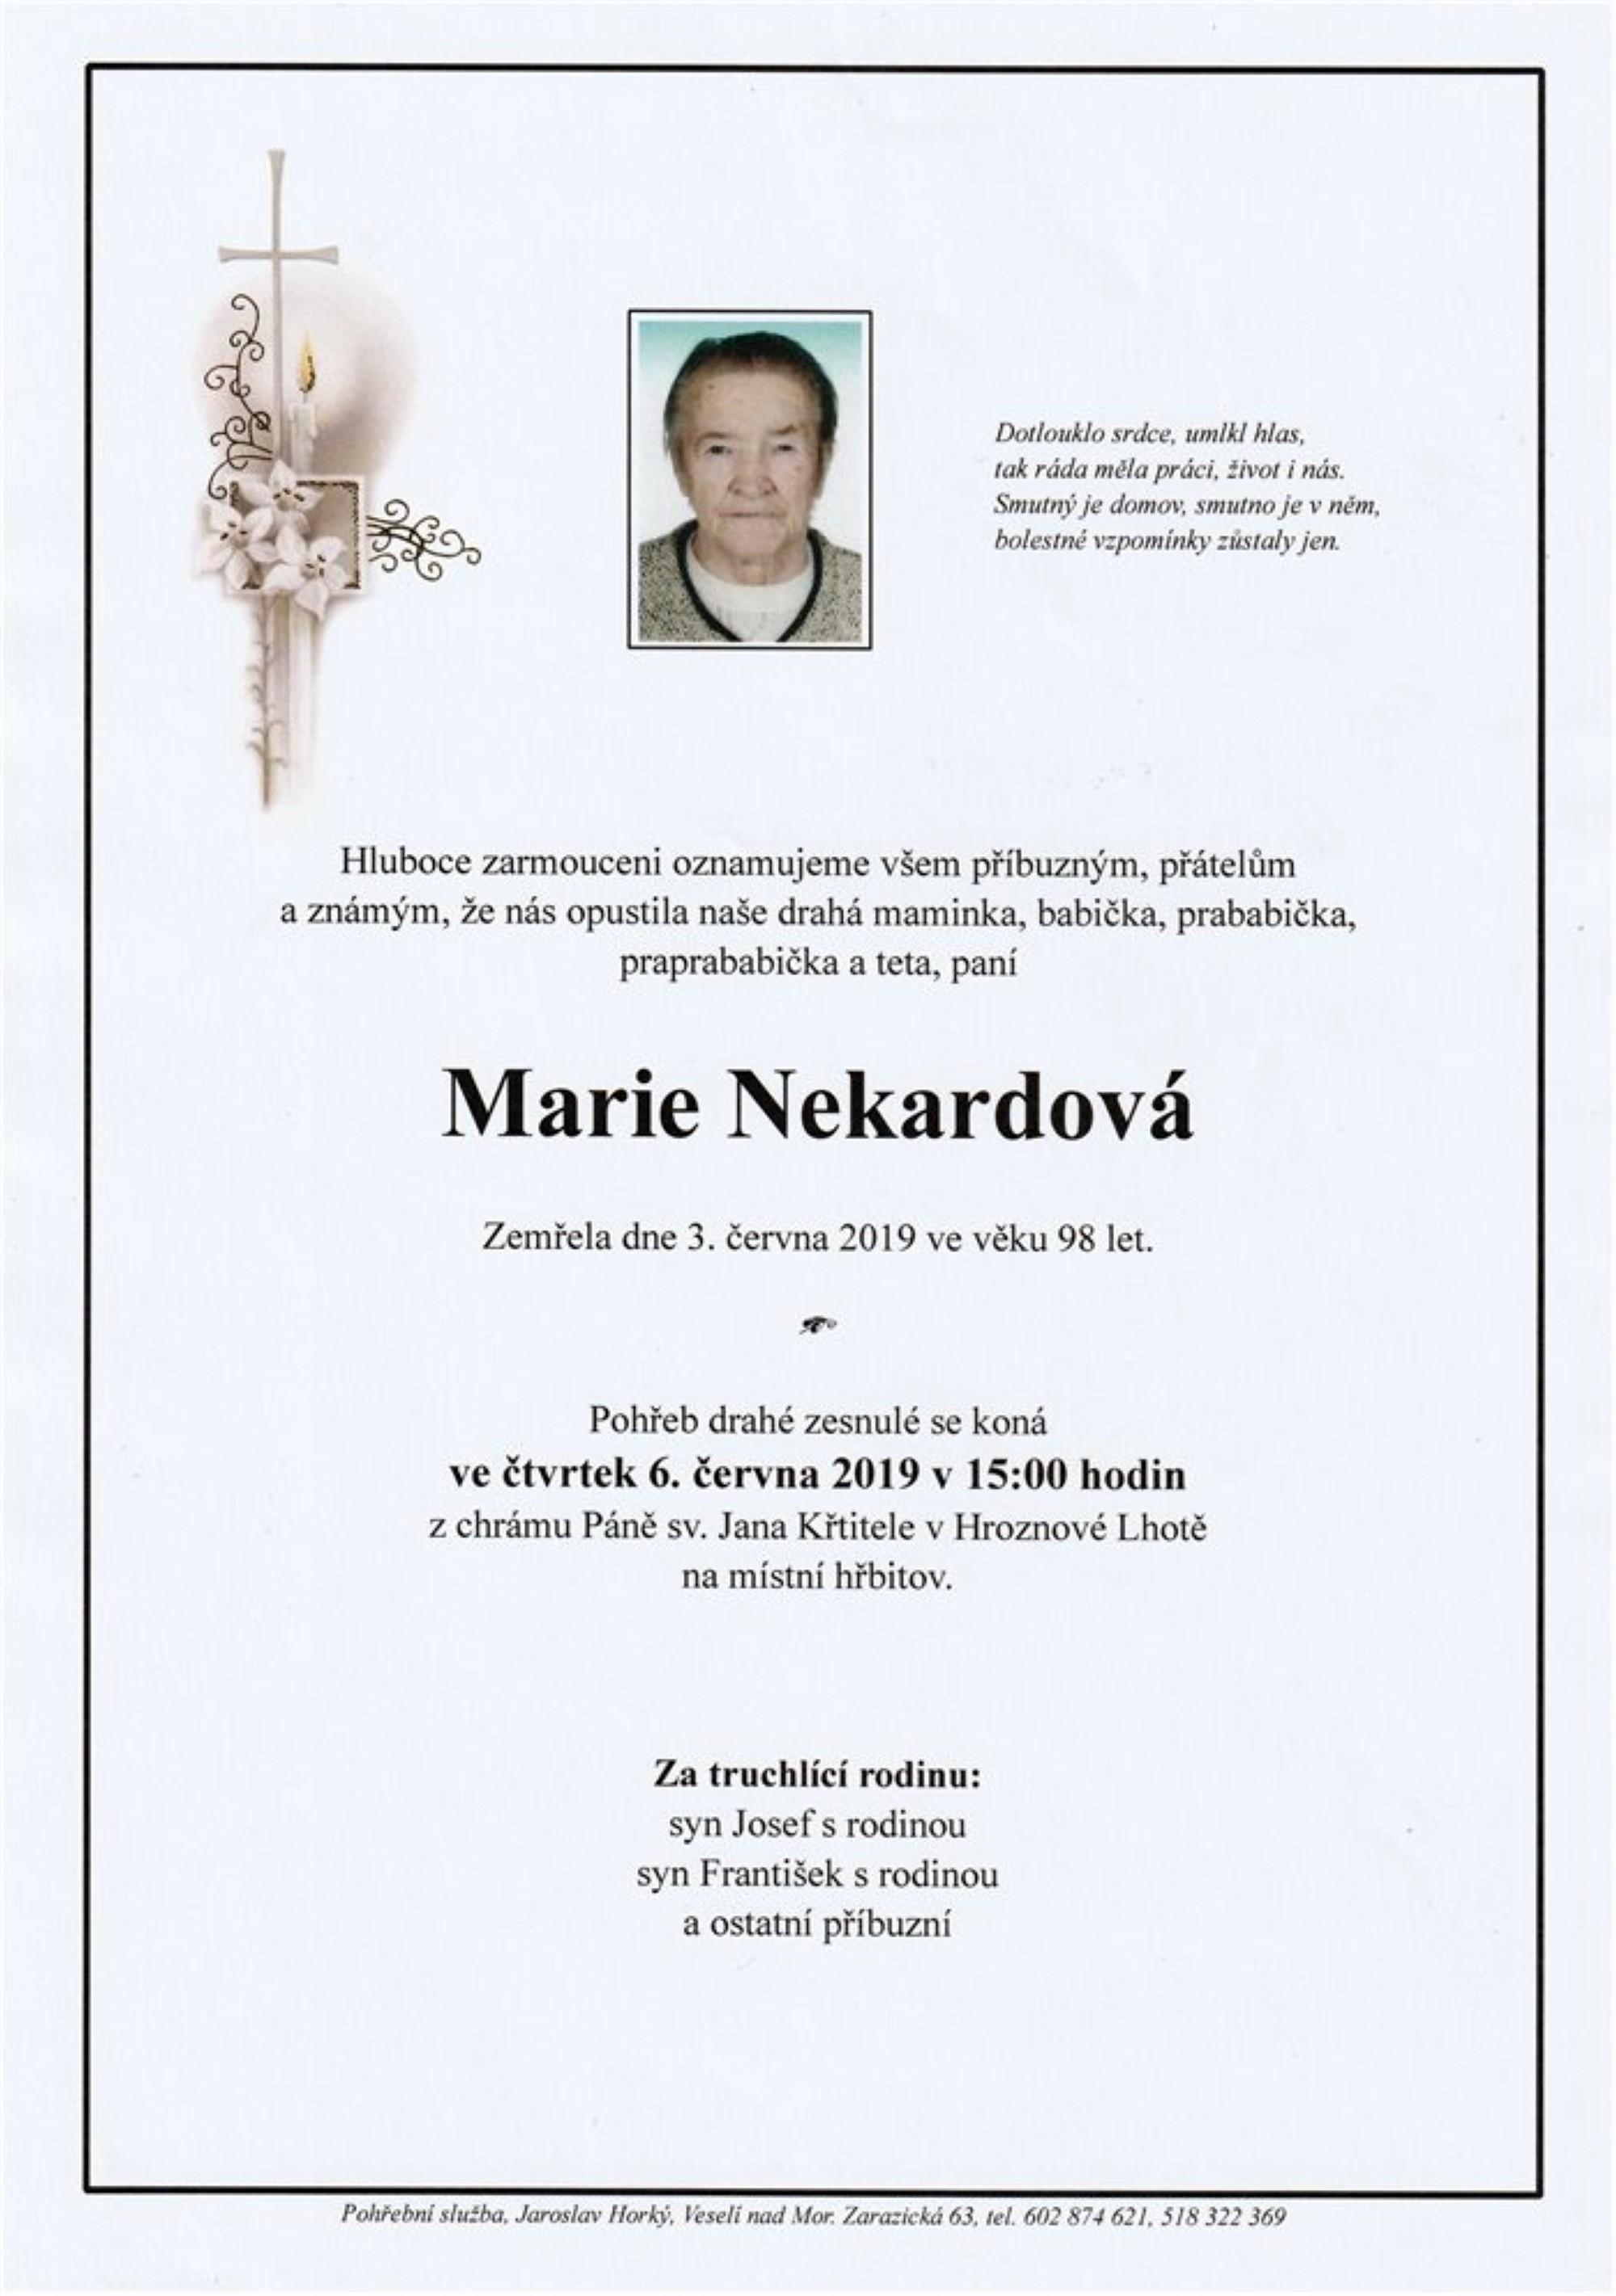 Marie Nekardová